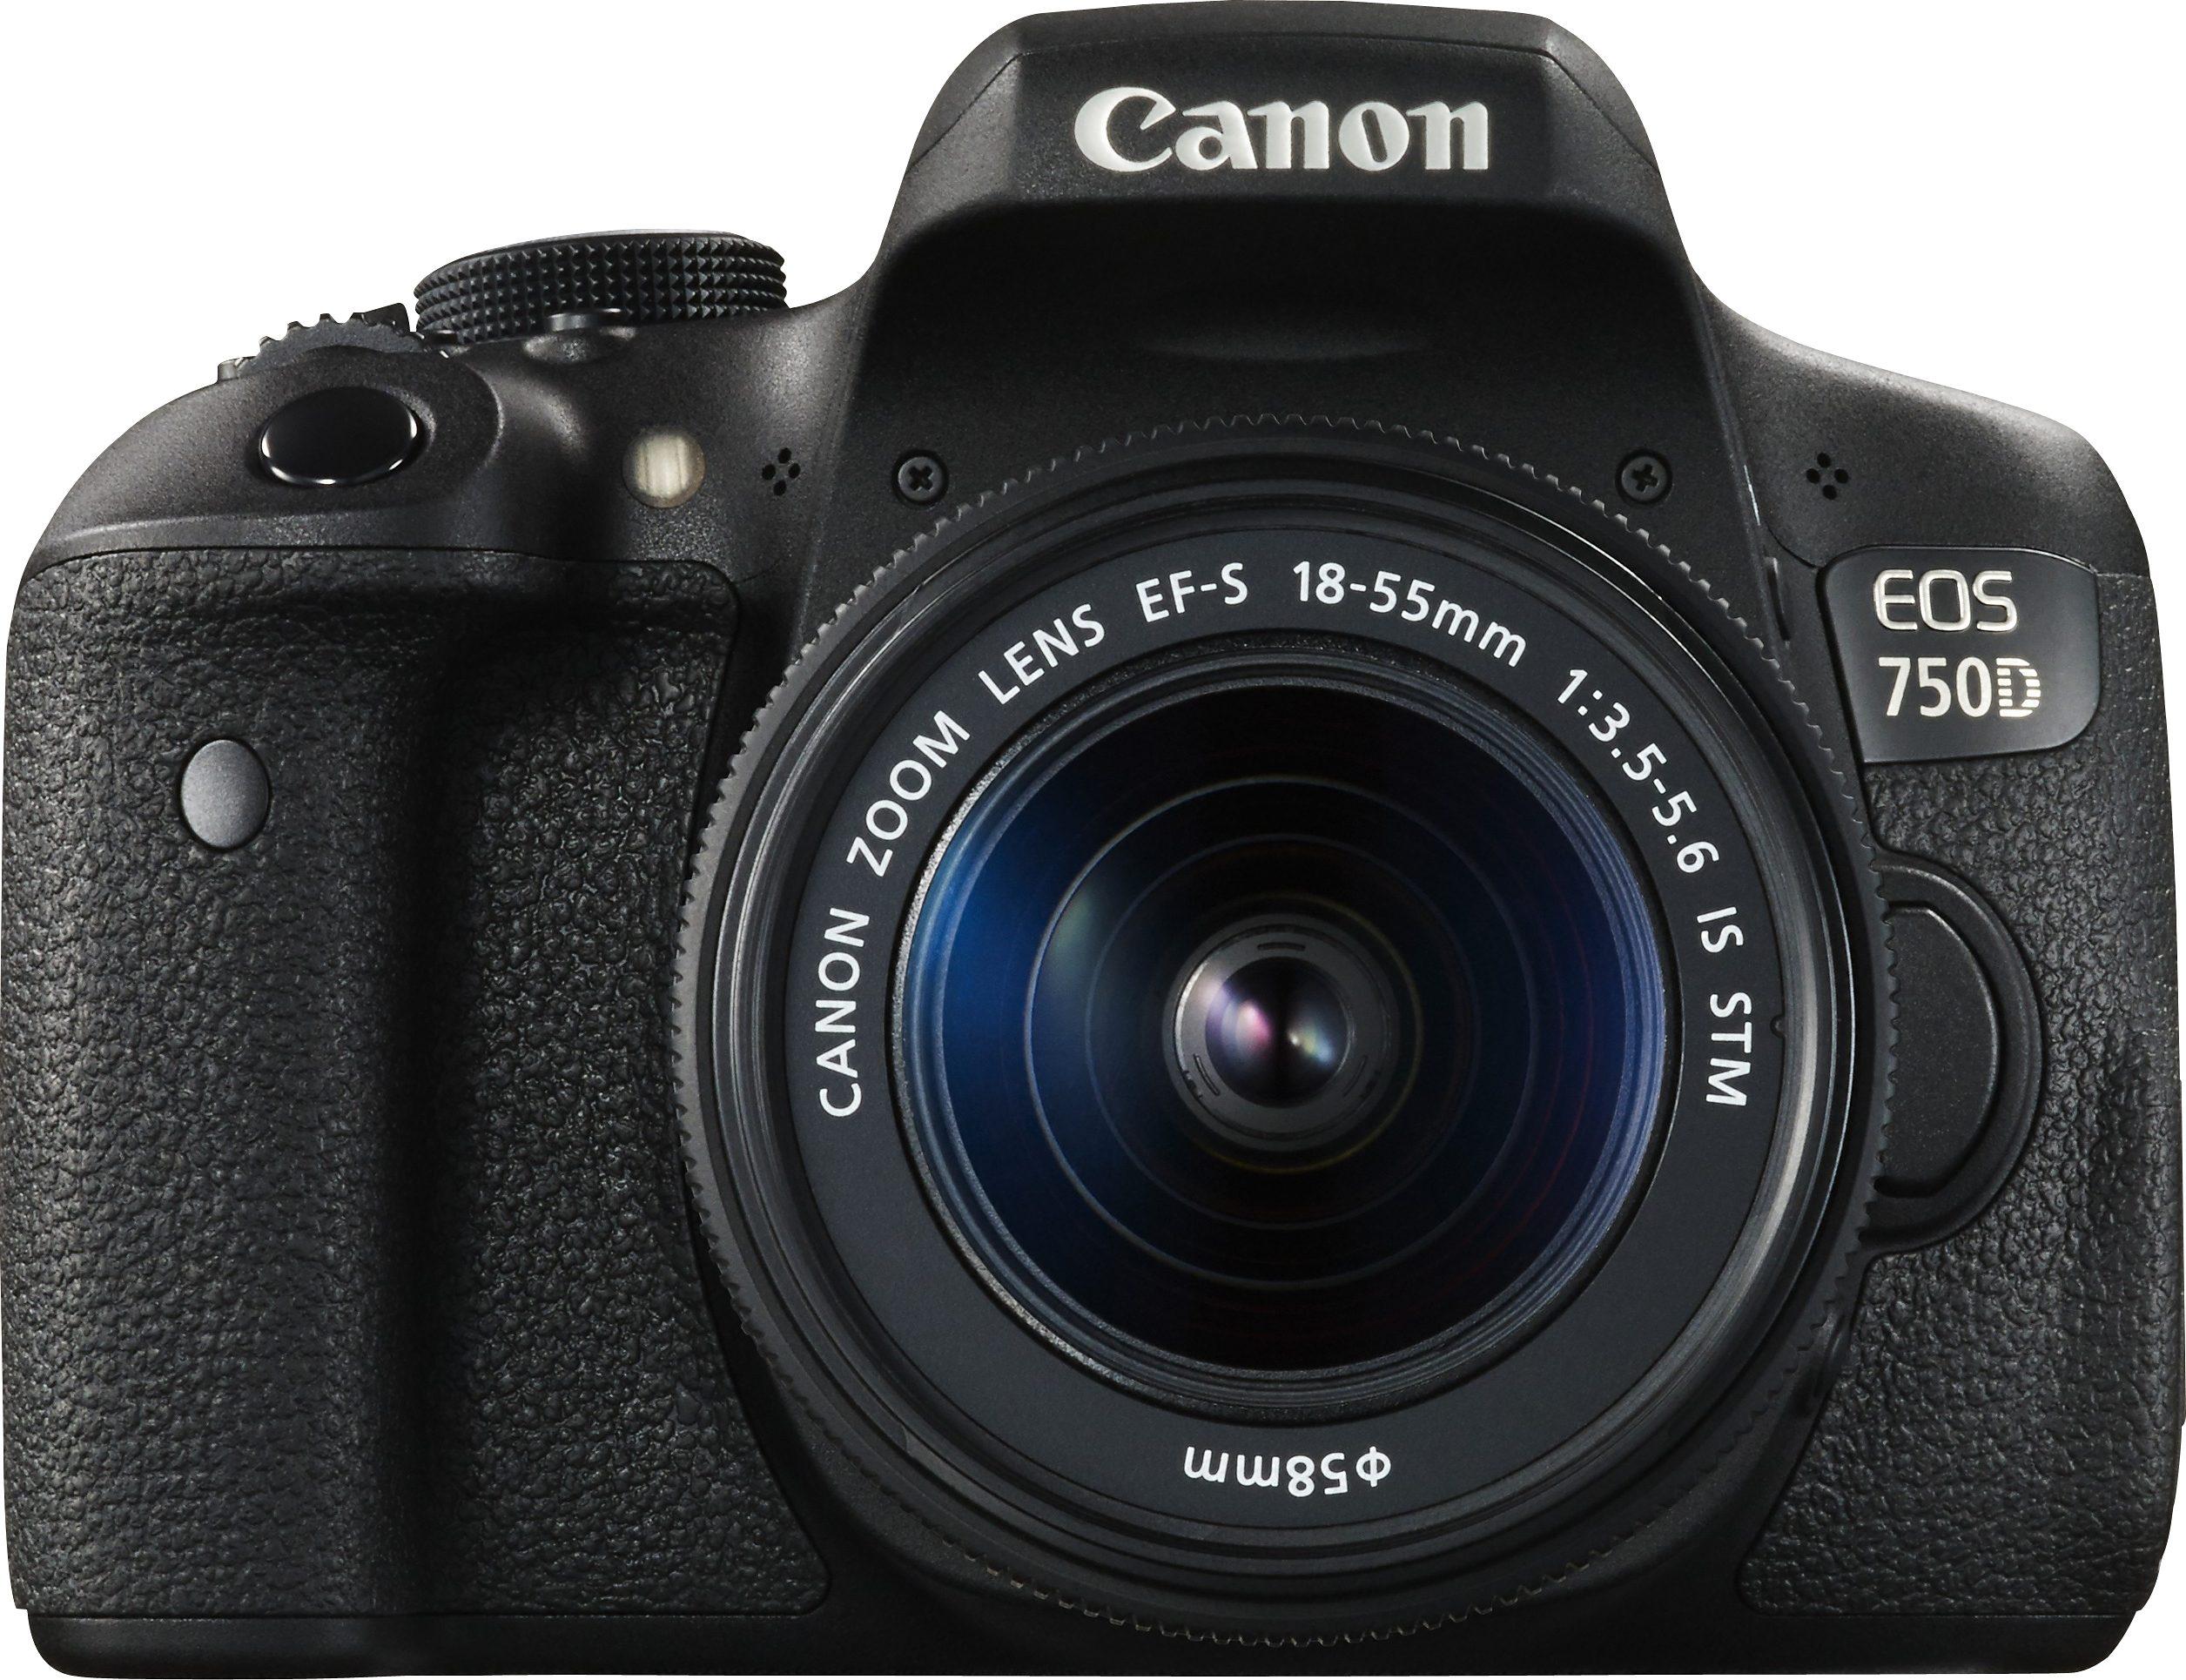 Canon EOS 750D Kit Spiegelreflex Kamera, Canon EF-S 18-55mm f/3.5-5.6 IS STM Zoom, 24,2 Megapixel